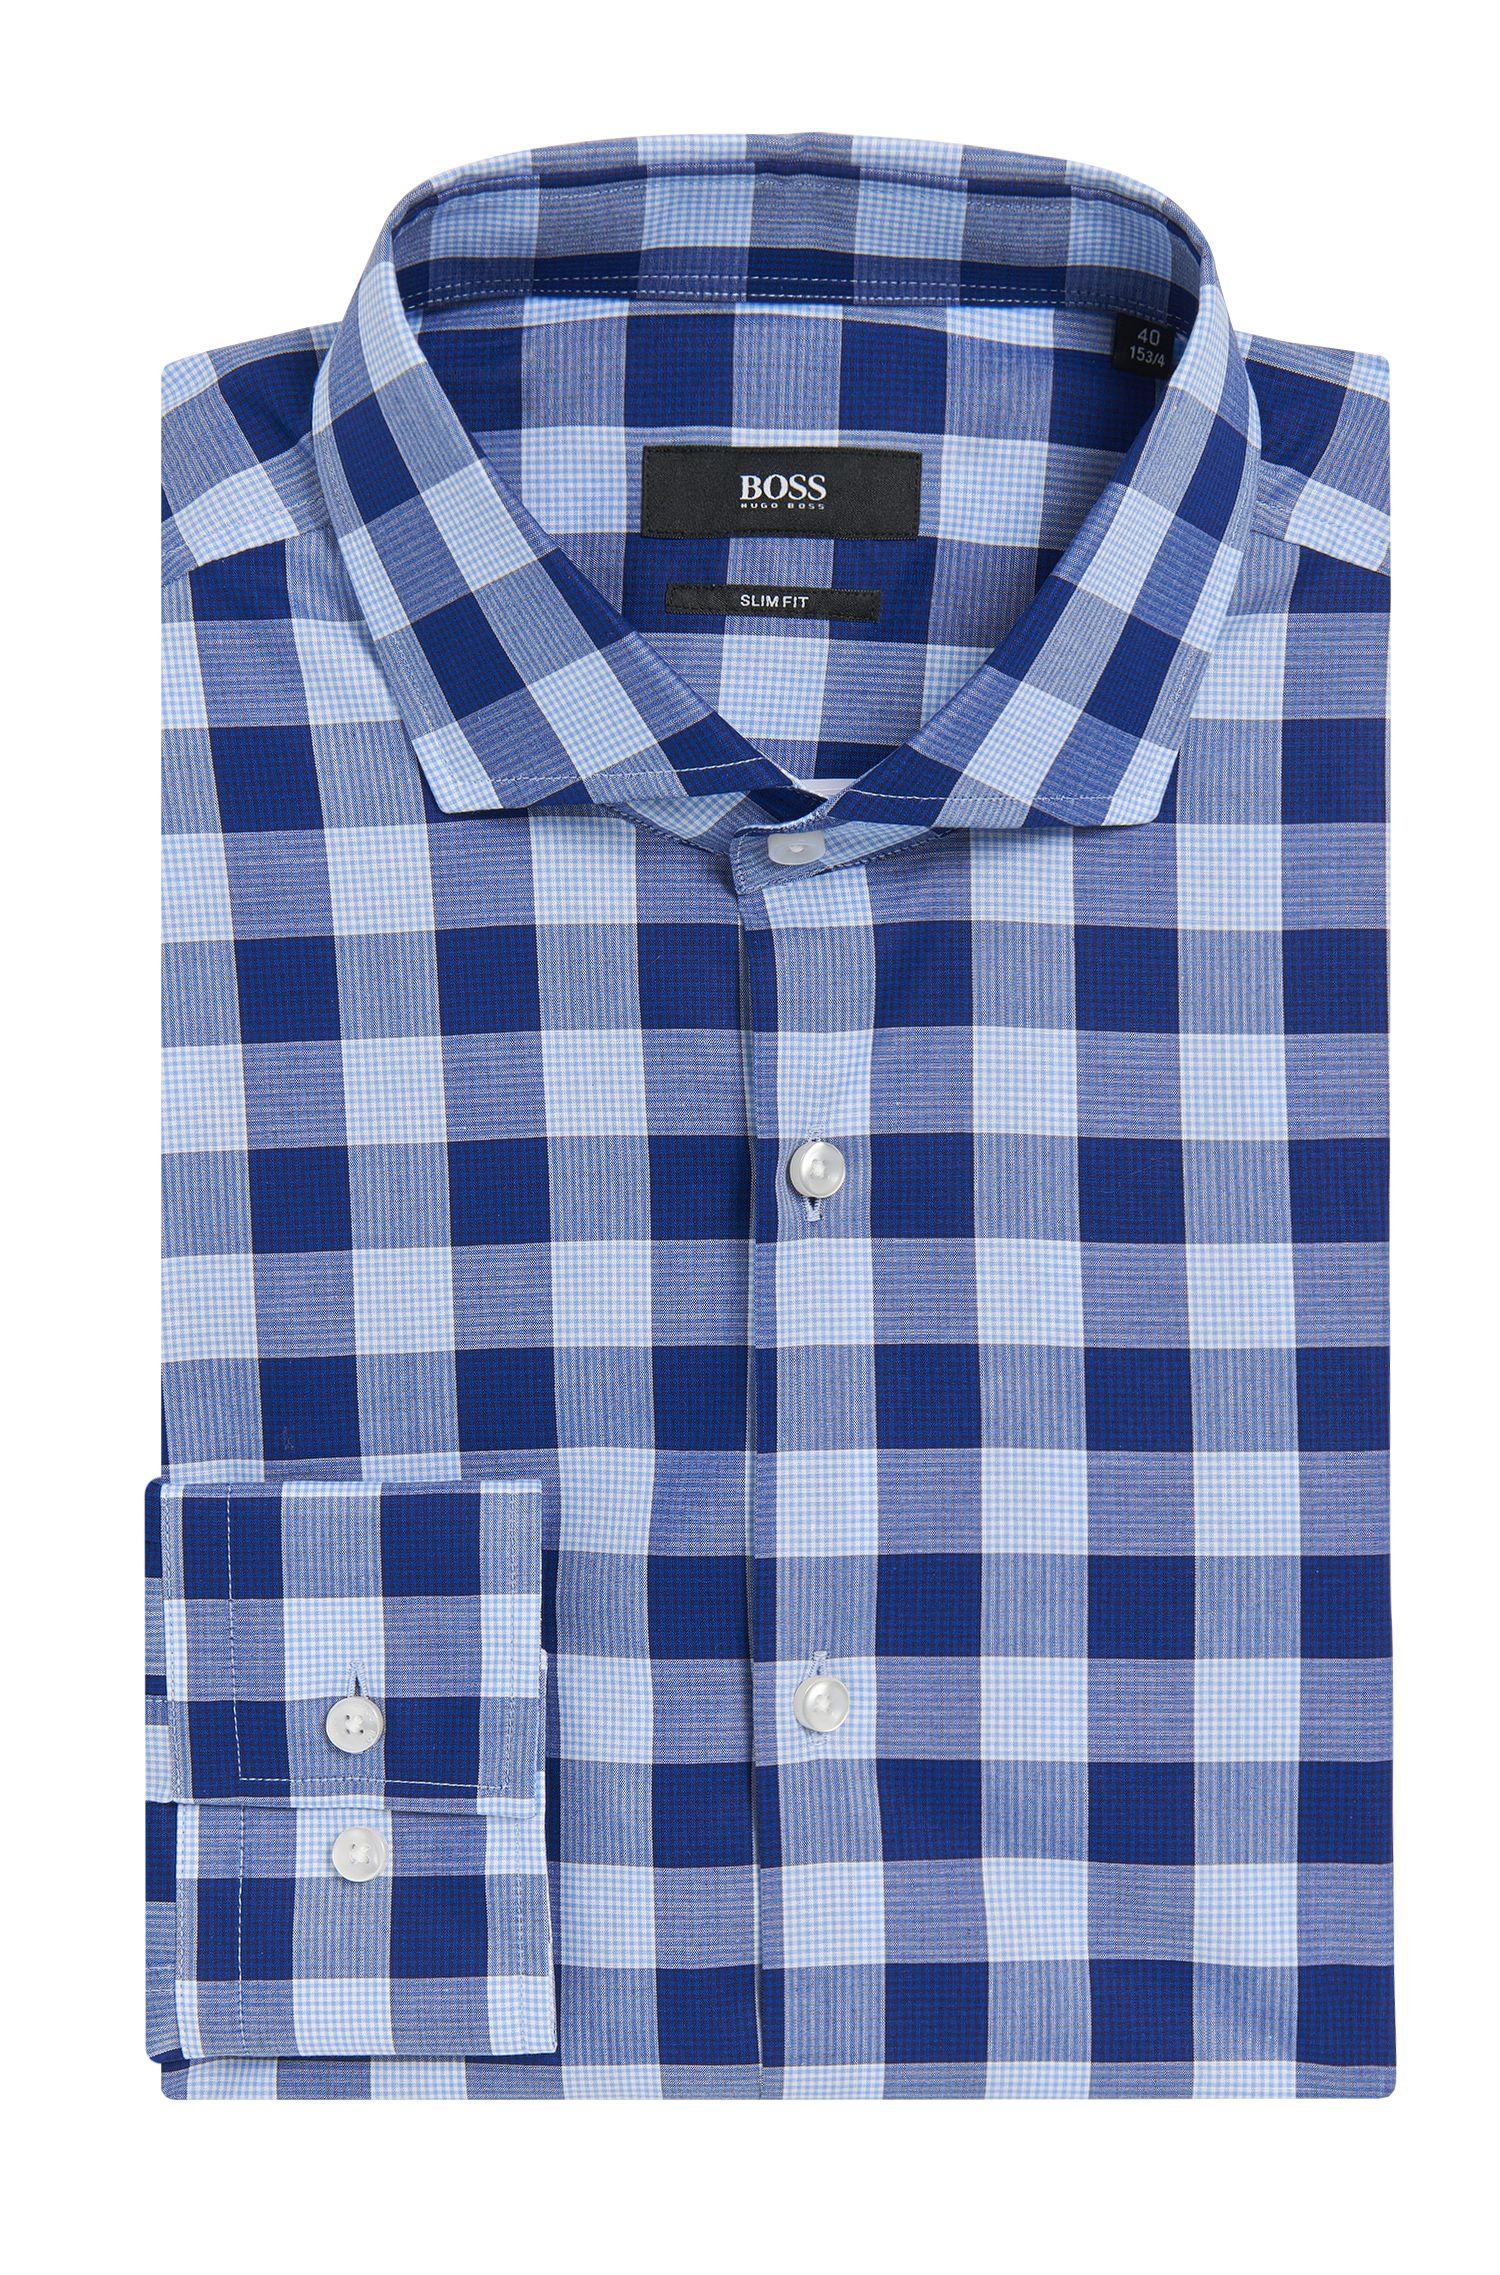 'Jason'   Slim Fit, Cotton Check Dress Shirt